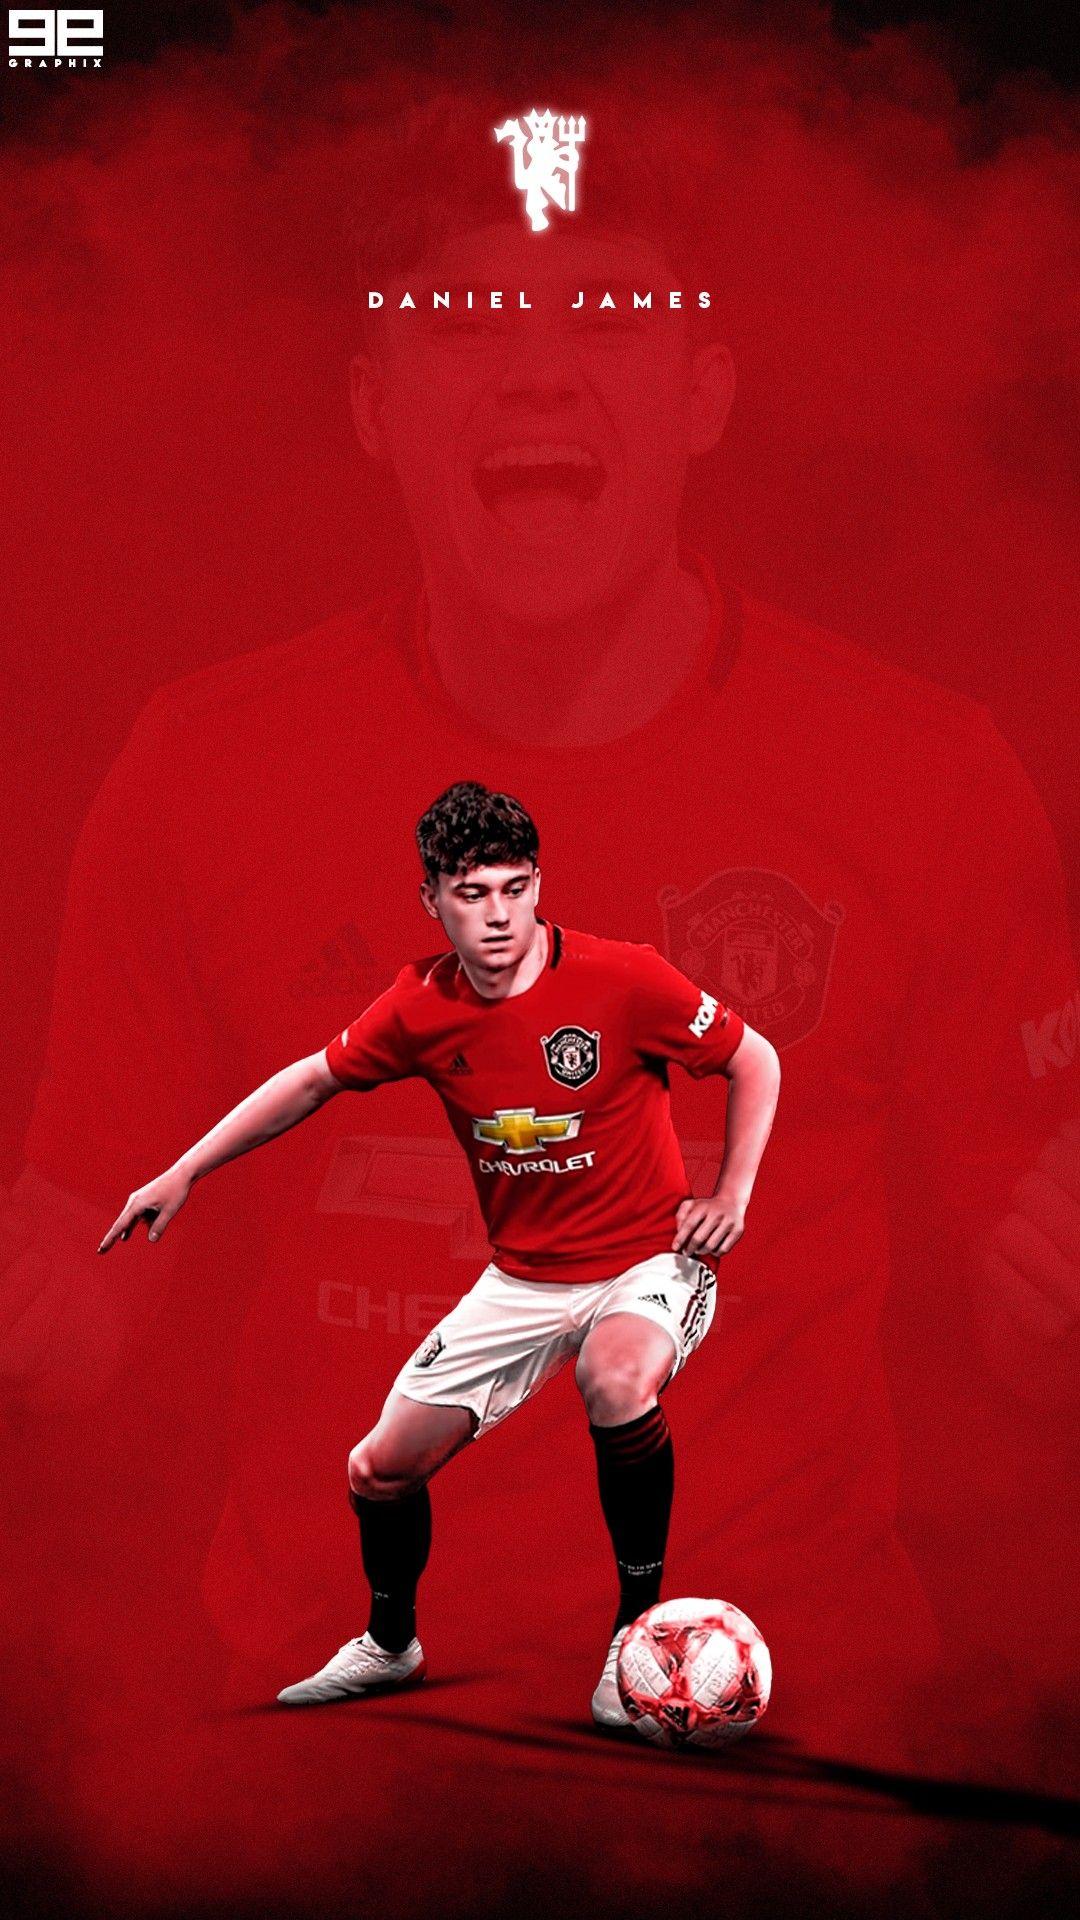 Daniel James Manchester United มีรูปภาพ